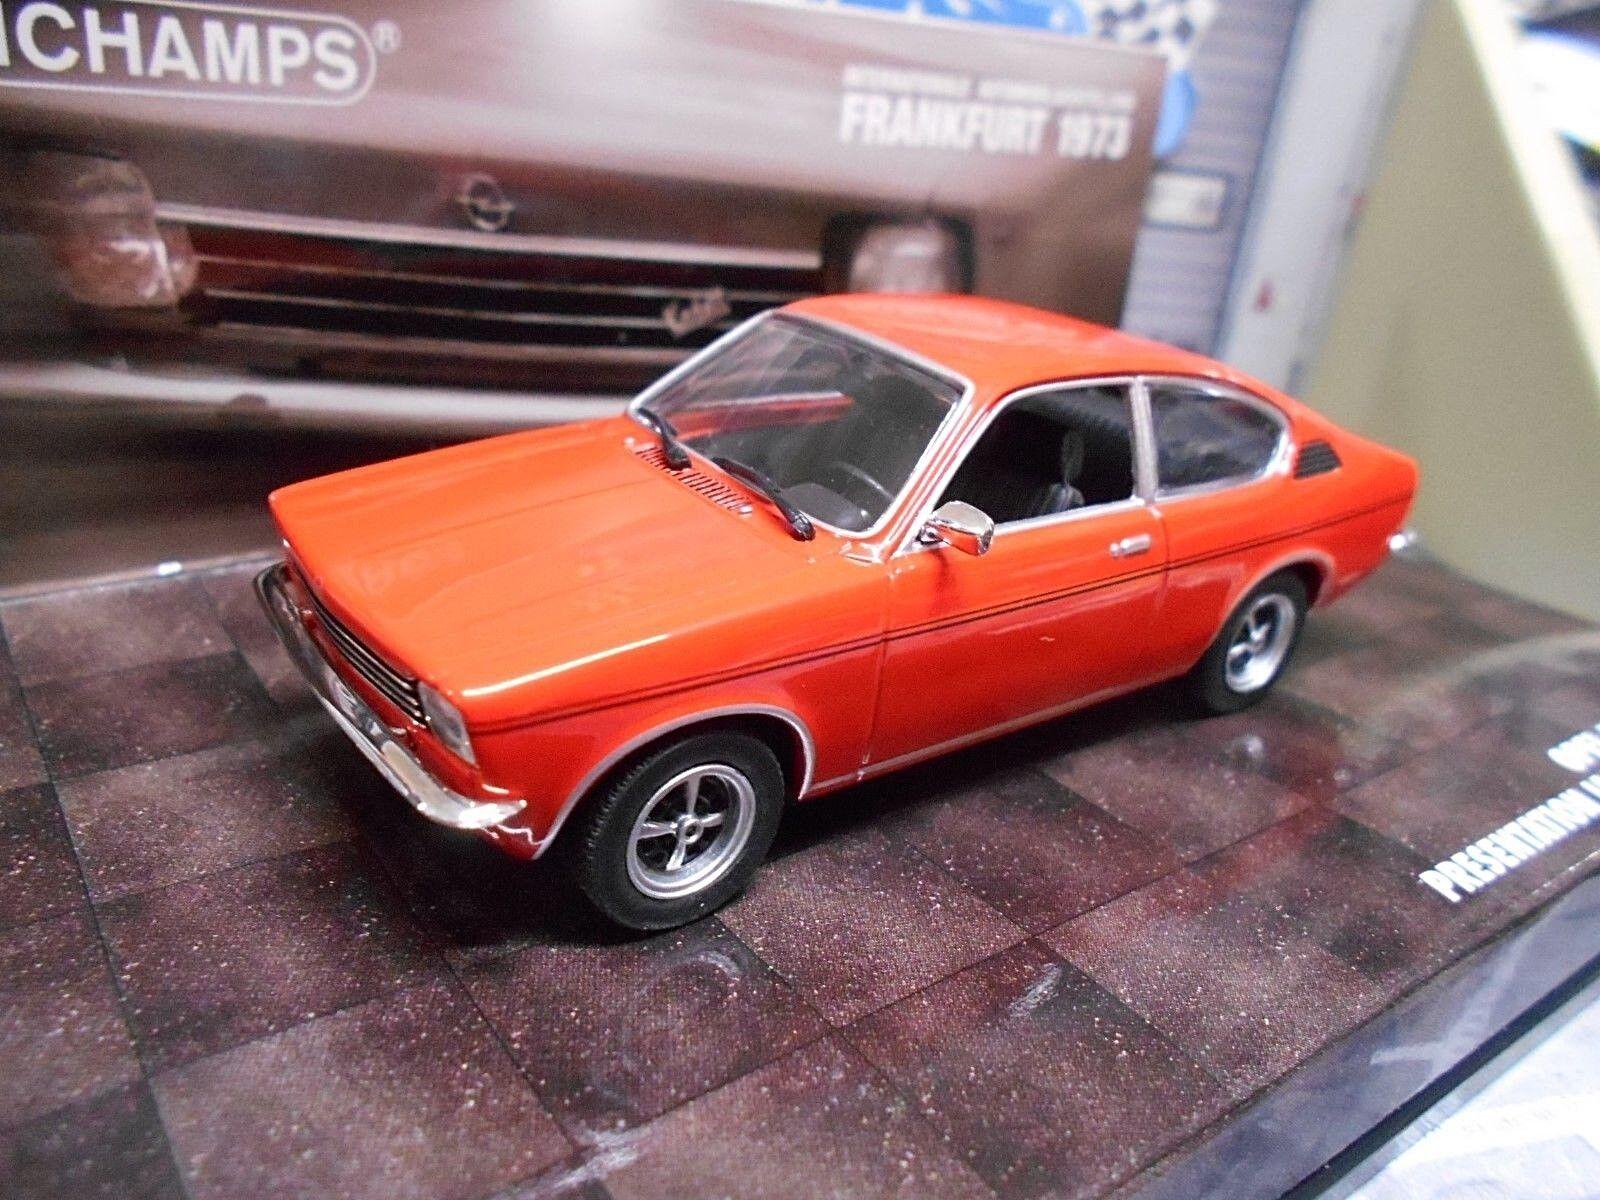 varios tamaños Opel C Kadett Coupe Coupe Coupe Hell rojo rojo ΑΙΑ Frankfurt 1973 presentación Minichamps 1 43  mejor calidad